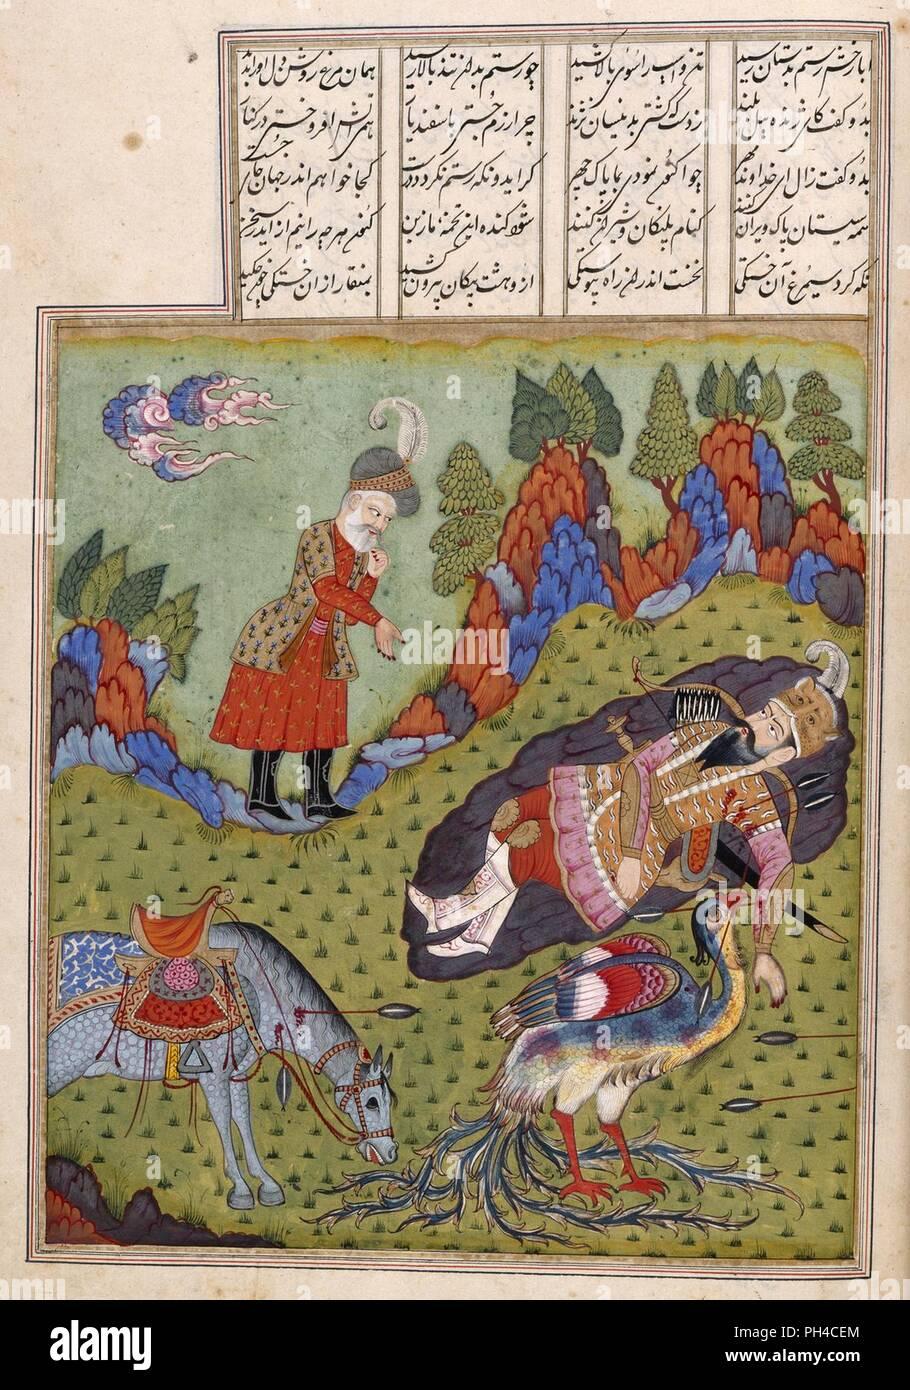 Shahnama. - 'The simurgh healing Rustam' . - Stock Image